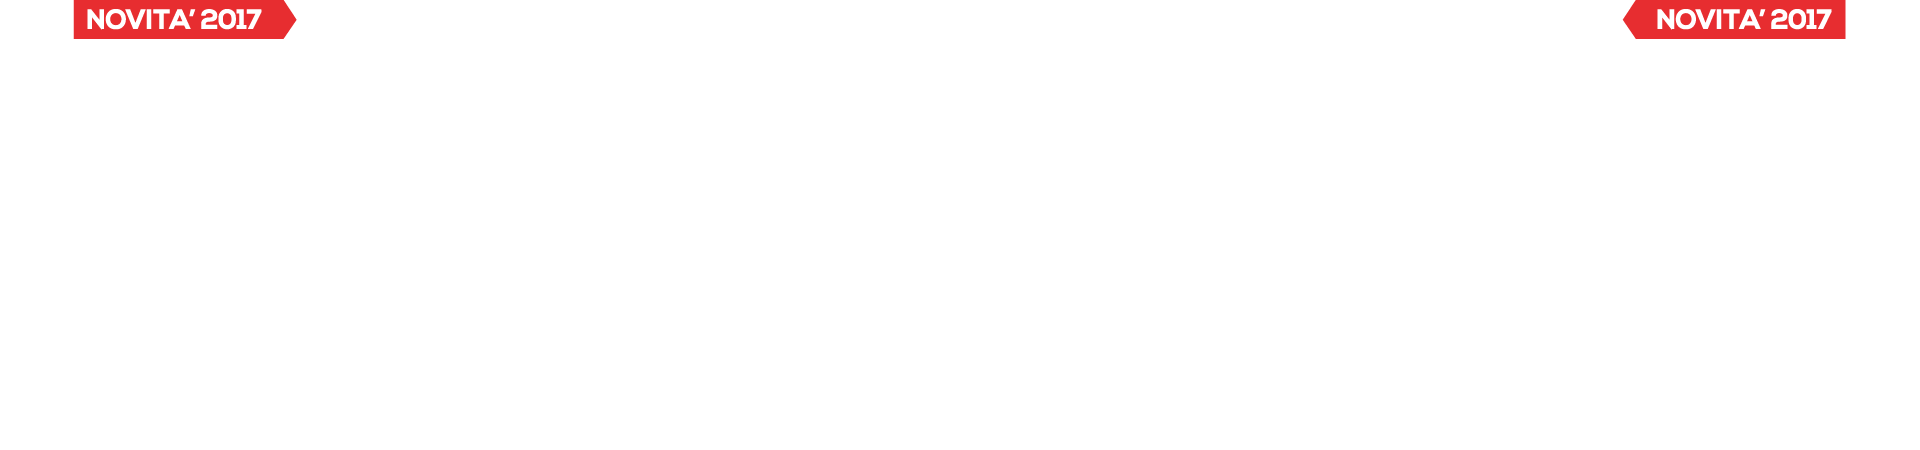 07_Novità2017